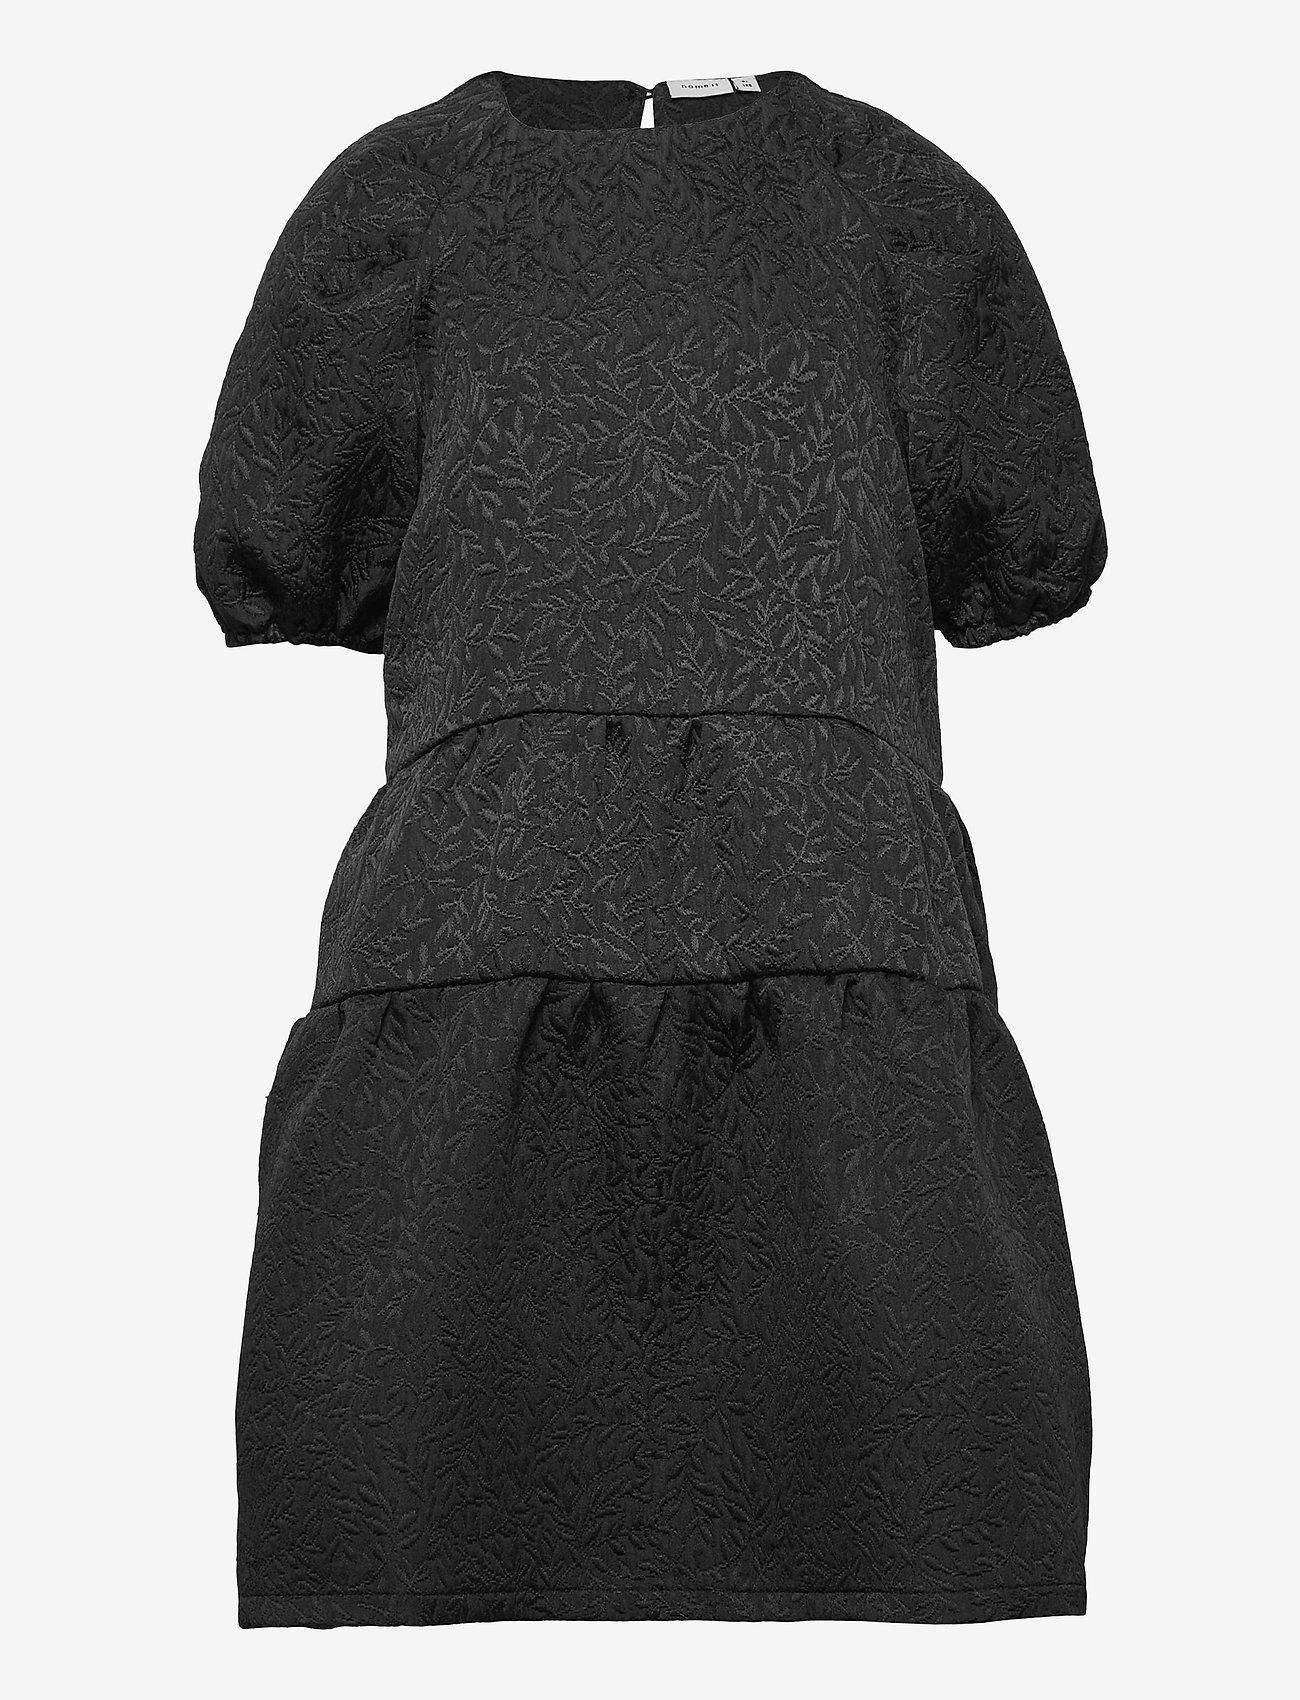 name it - NKFSALAST SS DRESS - kleider - black - 0